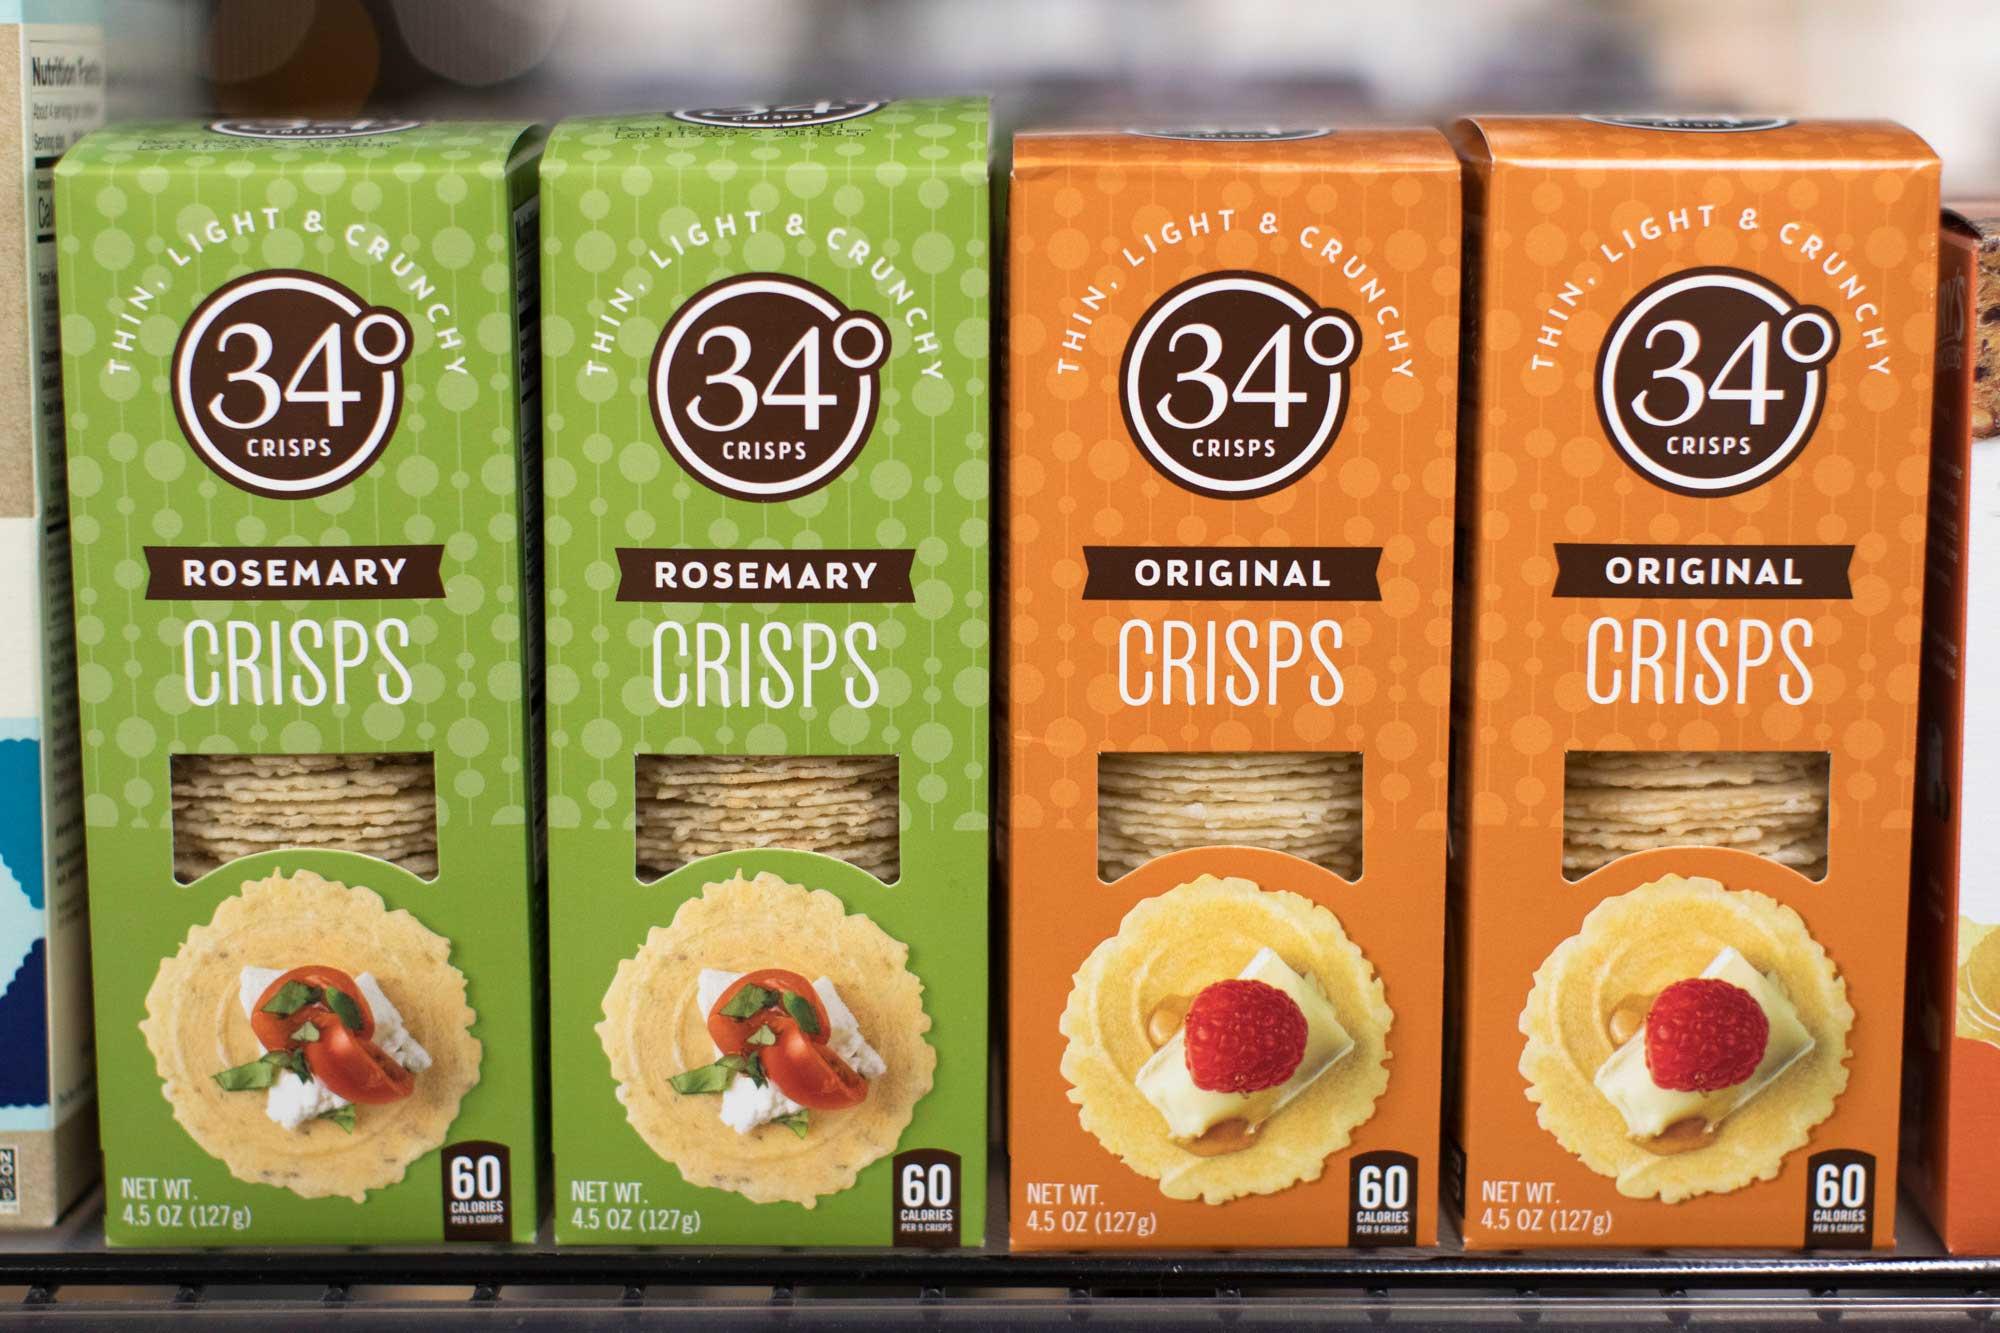 Thin Light and Crunchy 34 degree crisps